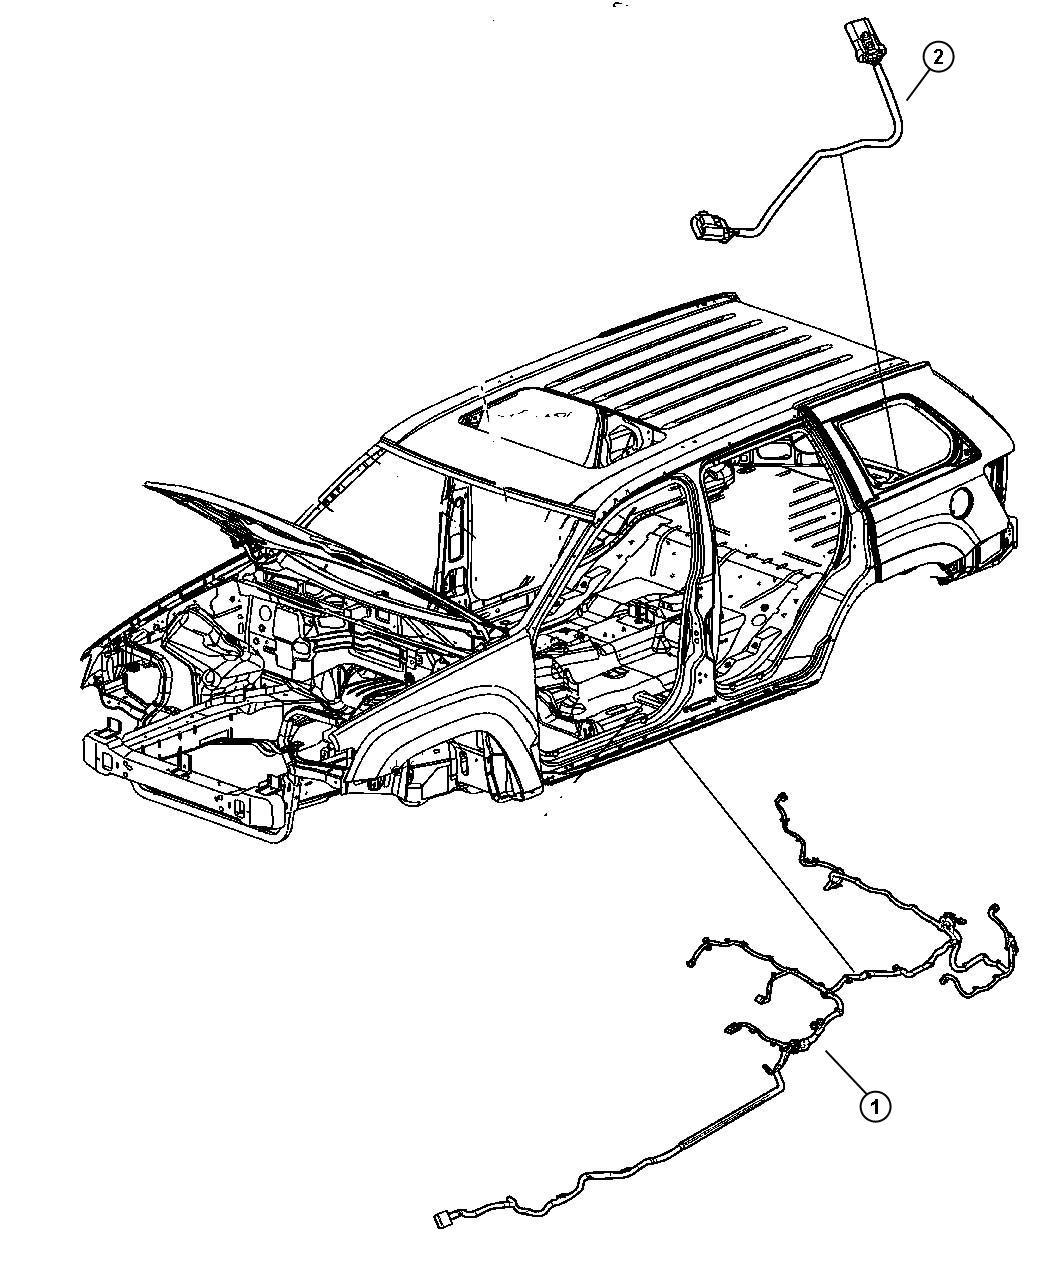 Jeep Grand Cherokee Wiring. Underbody. [tire pressure